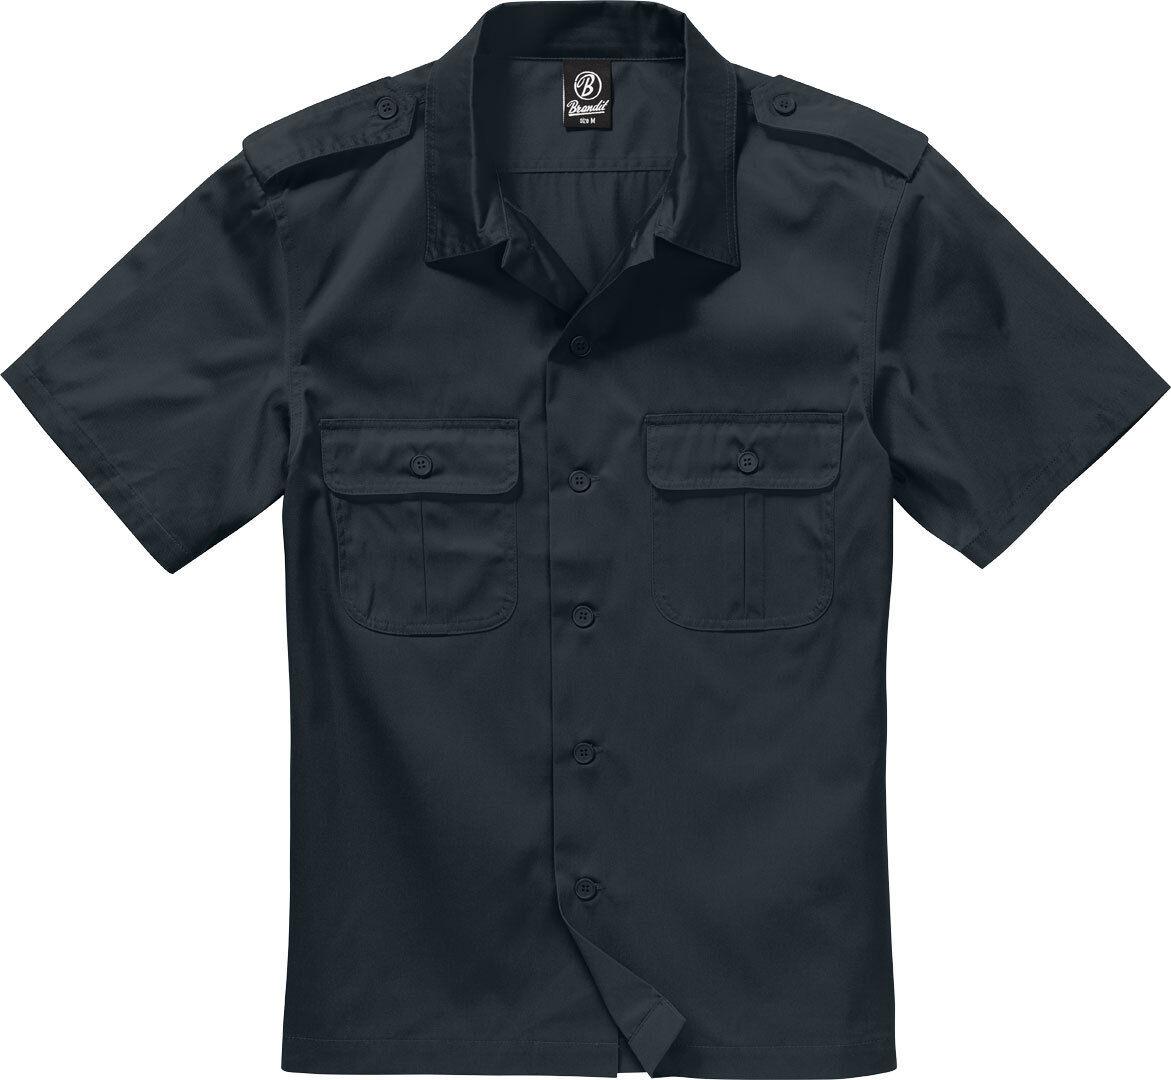 Brandit Us 1/2 Paita  - Musta - Size: 3XL